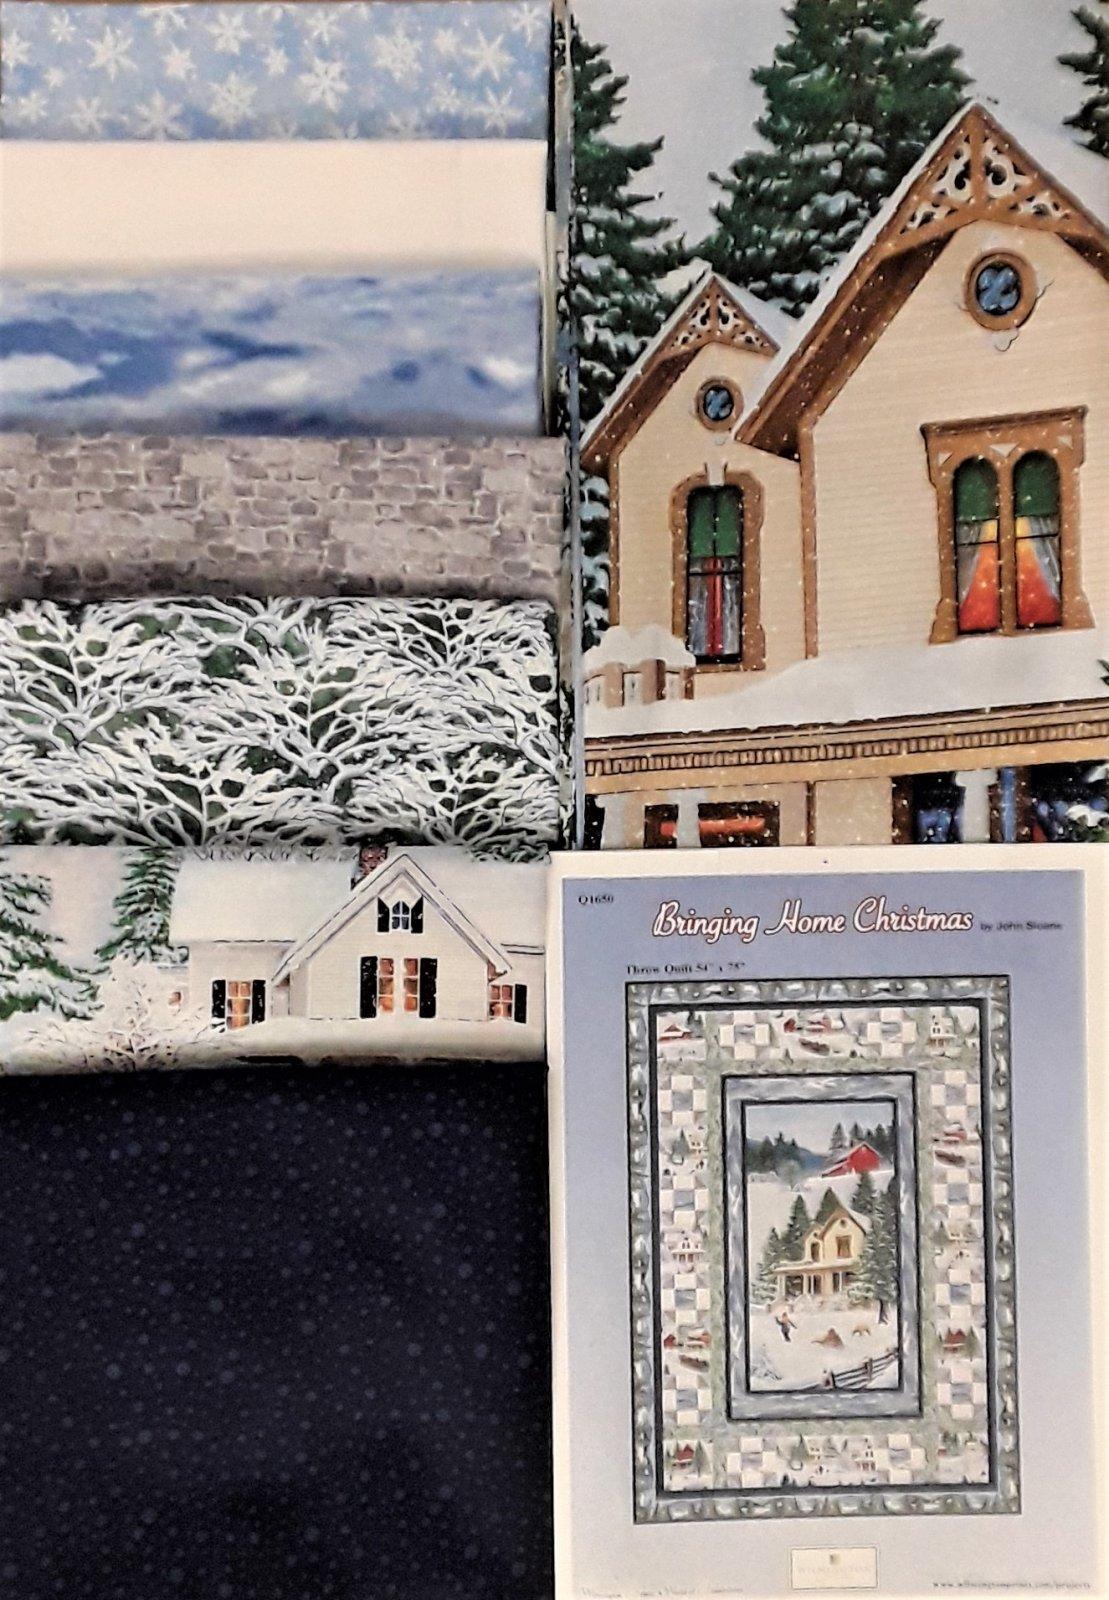 Bringing Home Christmas Quilt Kit